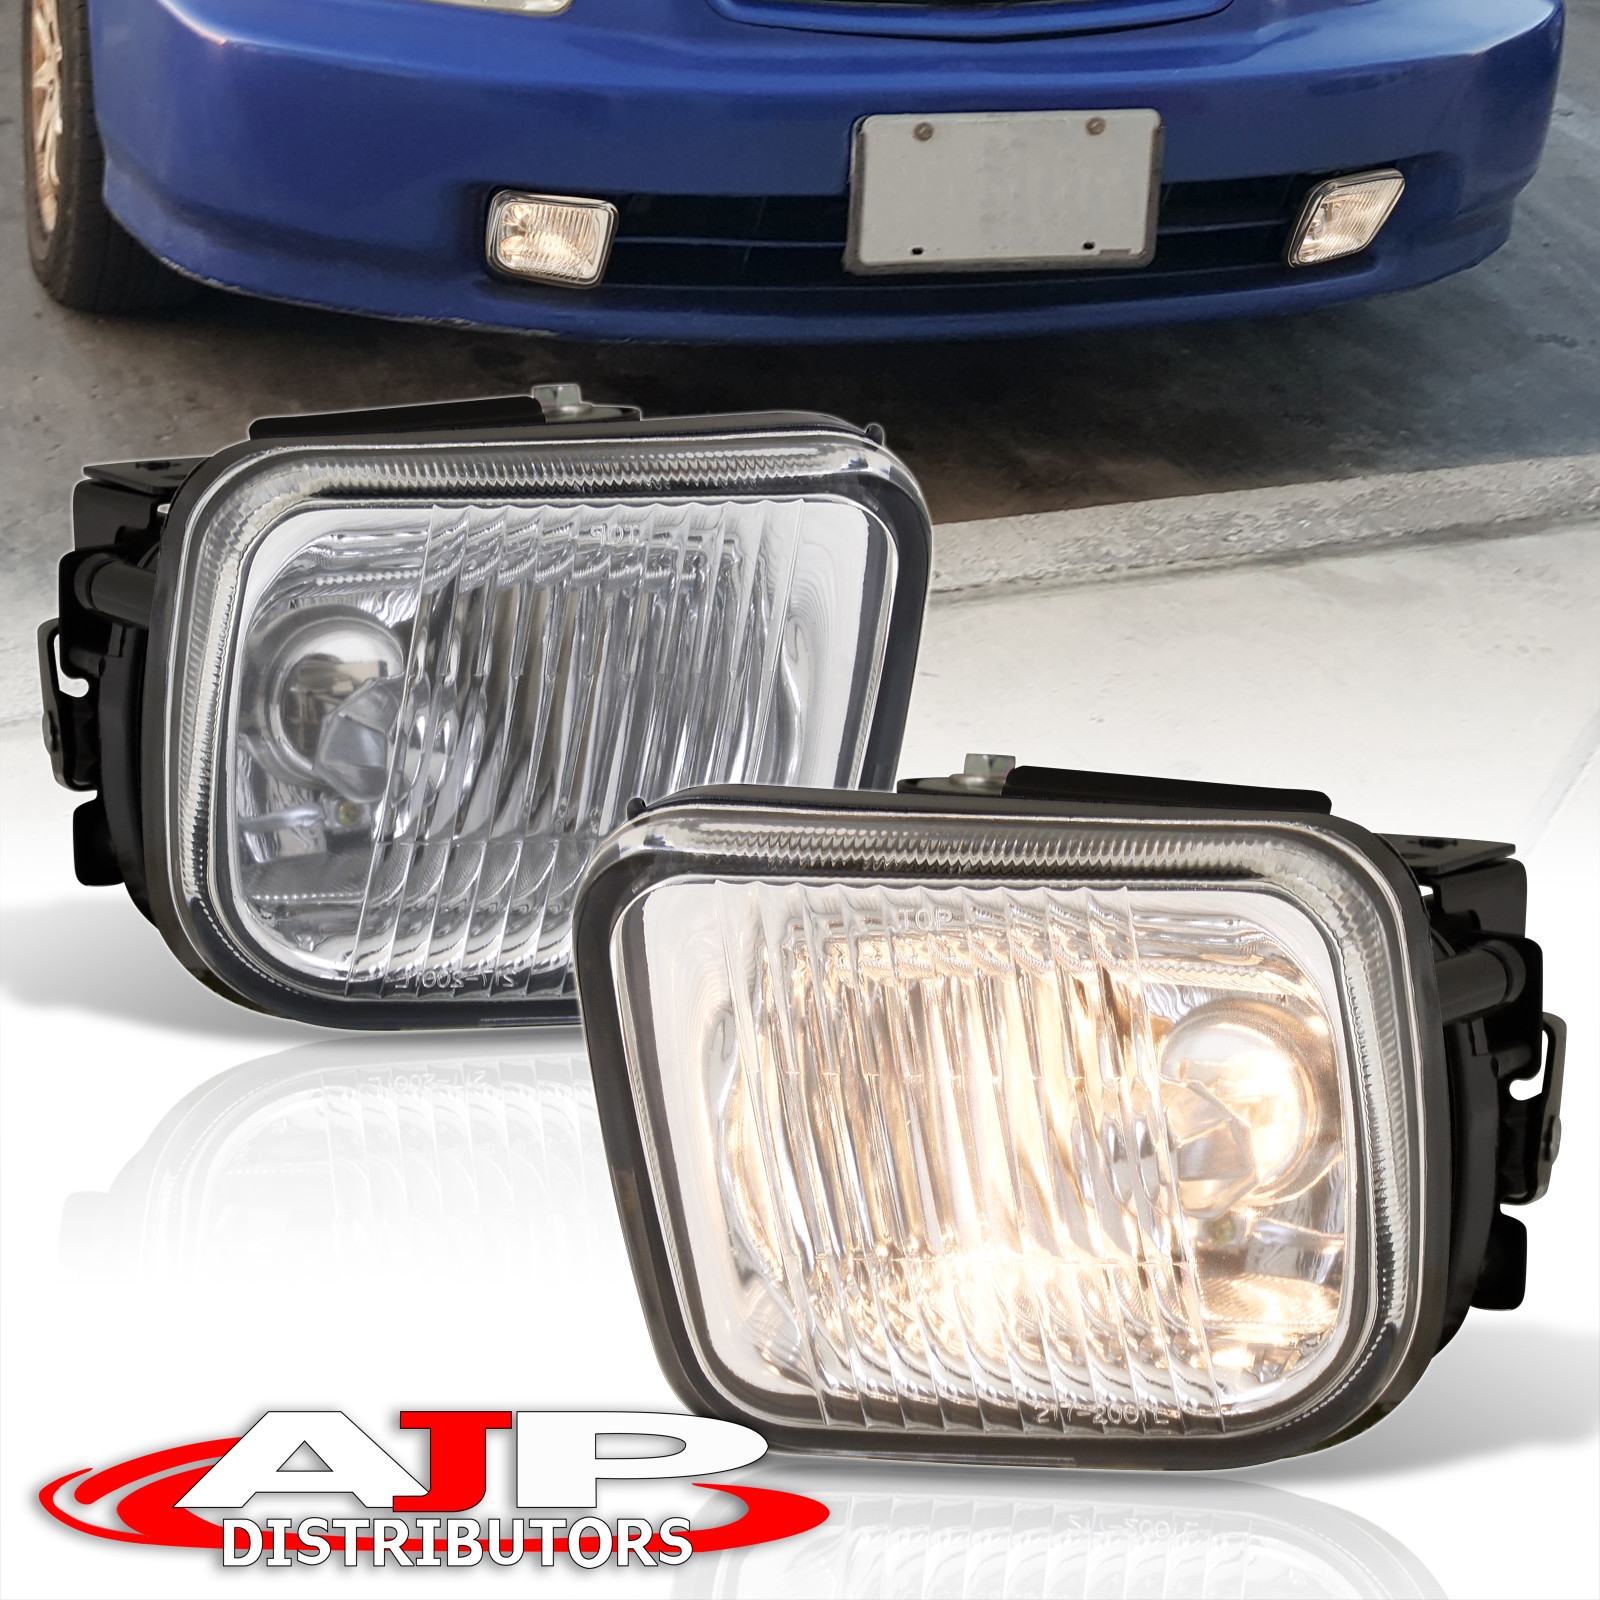 hight resolution of honda civic lx dx ex clear lens glass fog lights w wiring harness 96 97 98 ek